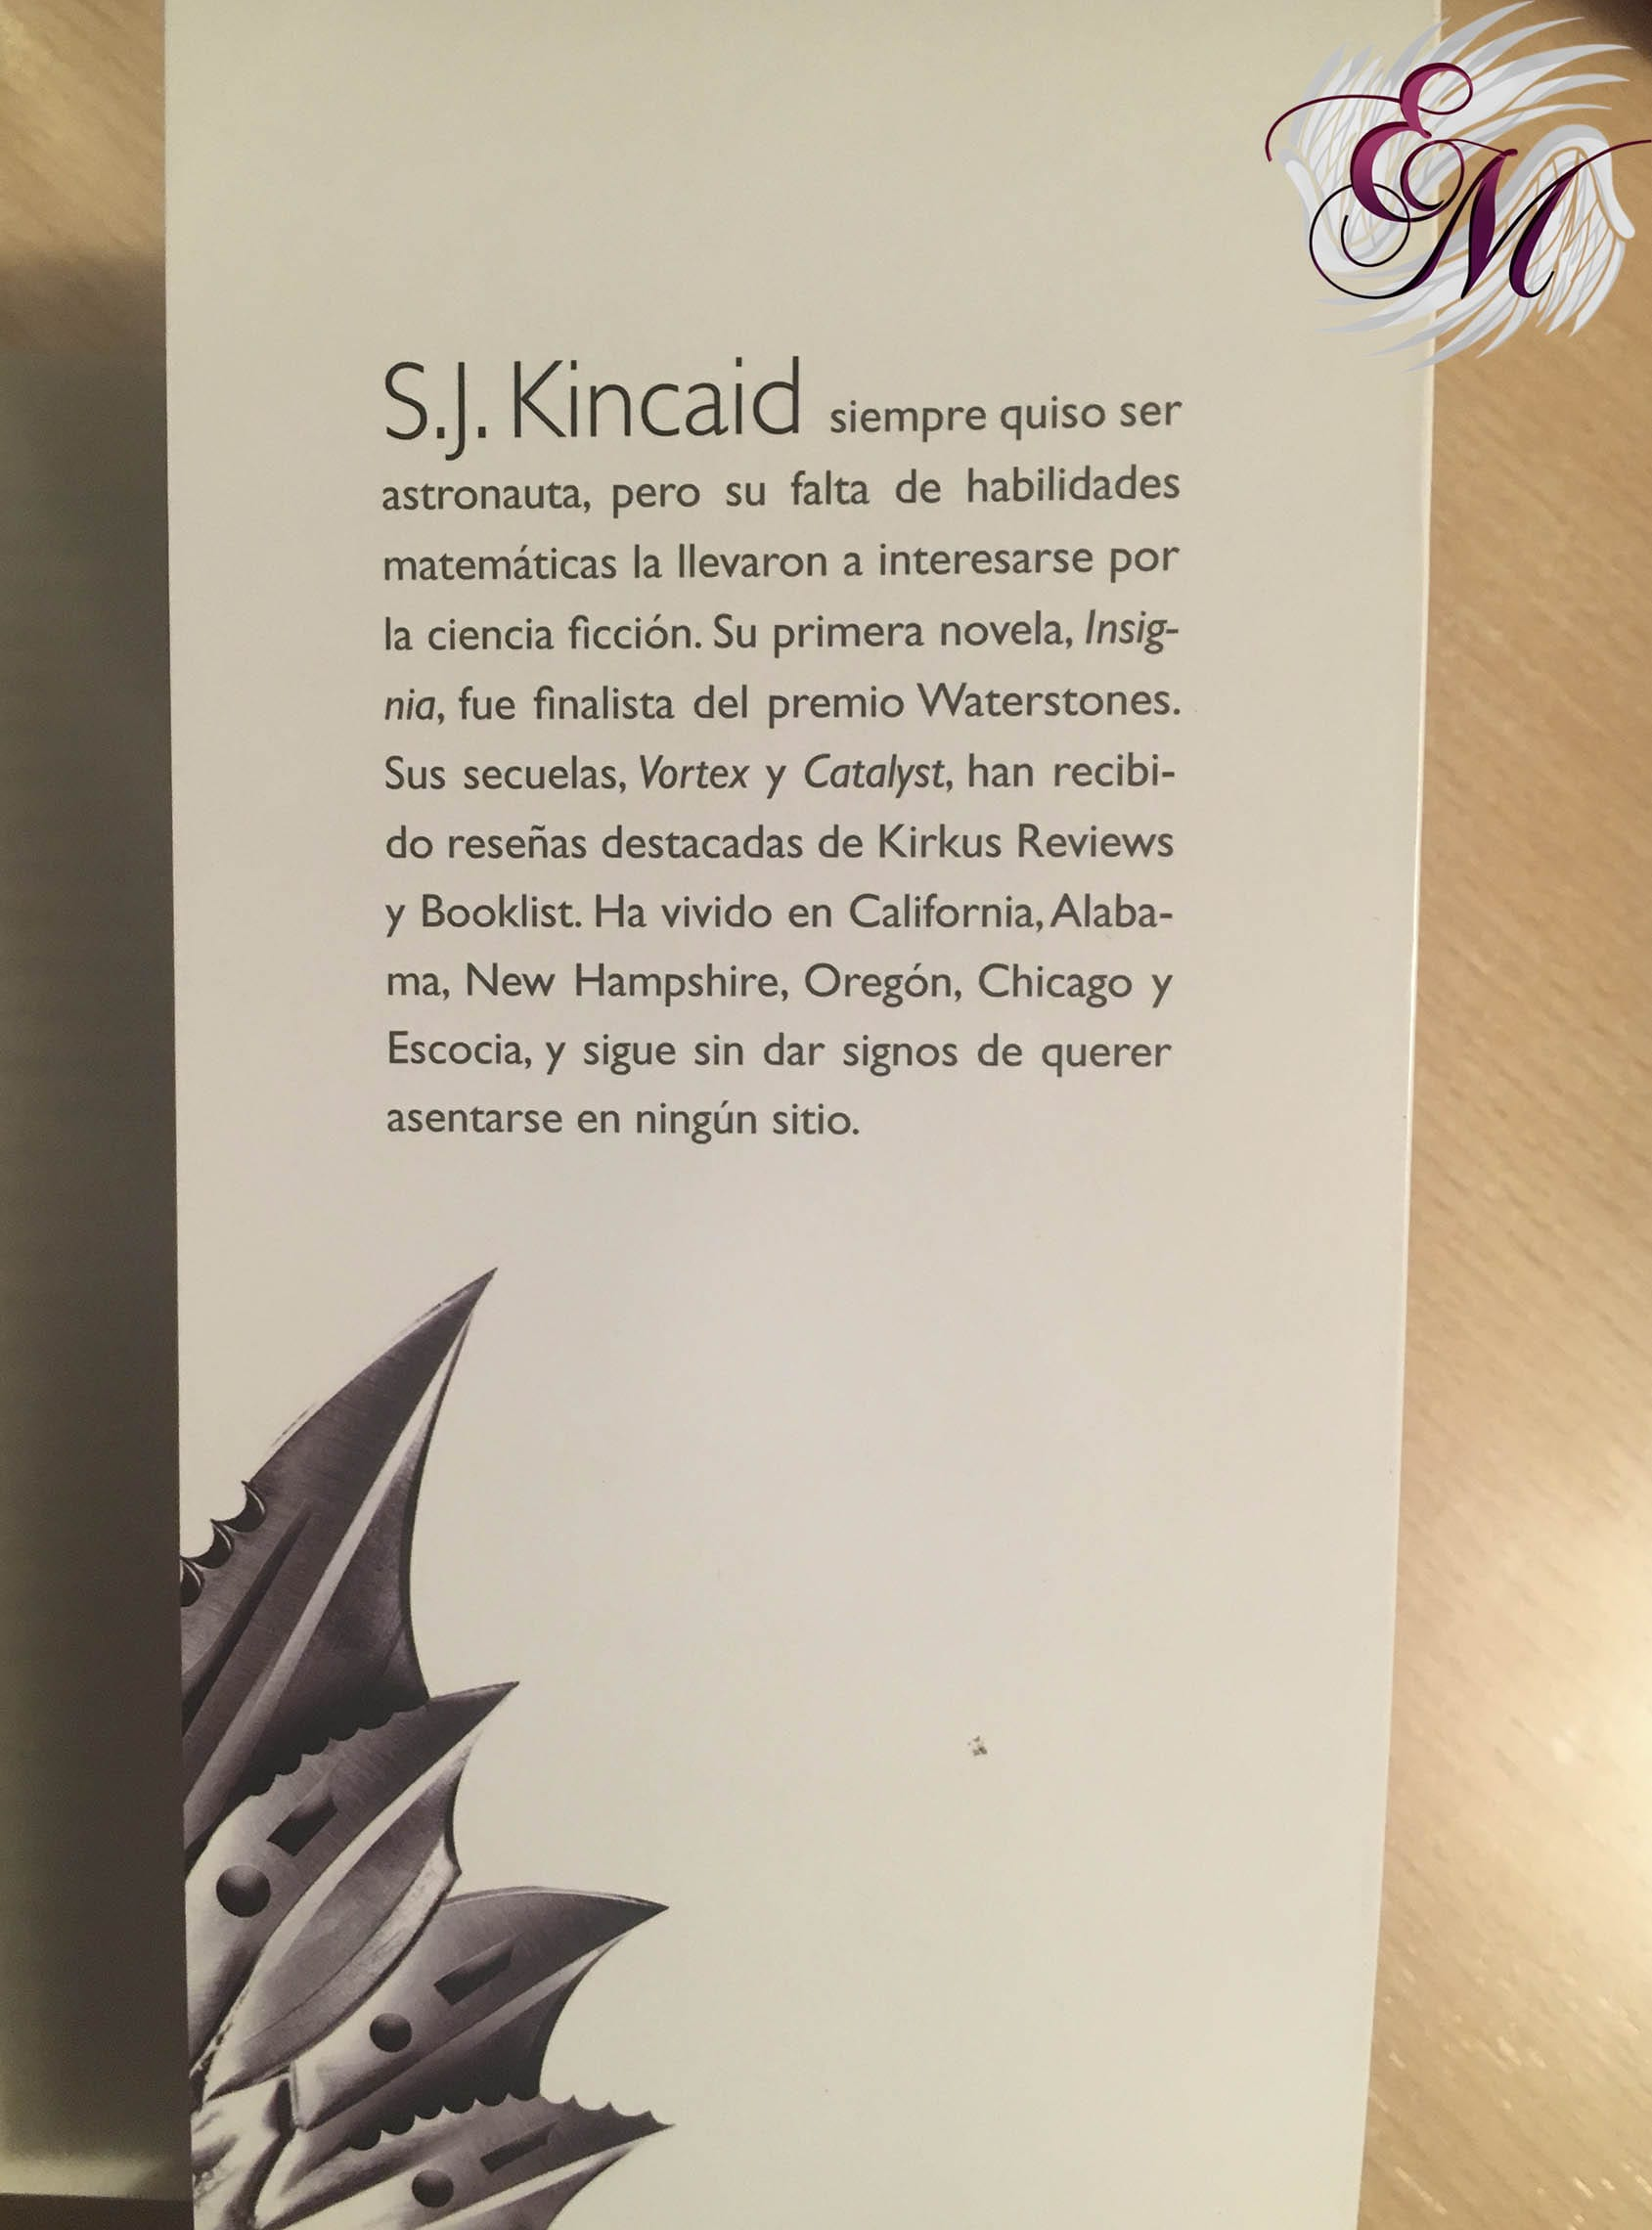 Diabólica, de S. J. Kincaid - Reseña